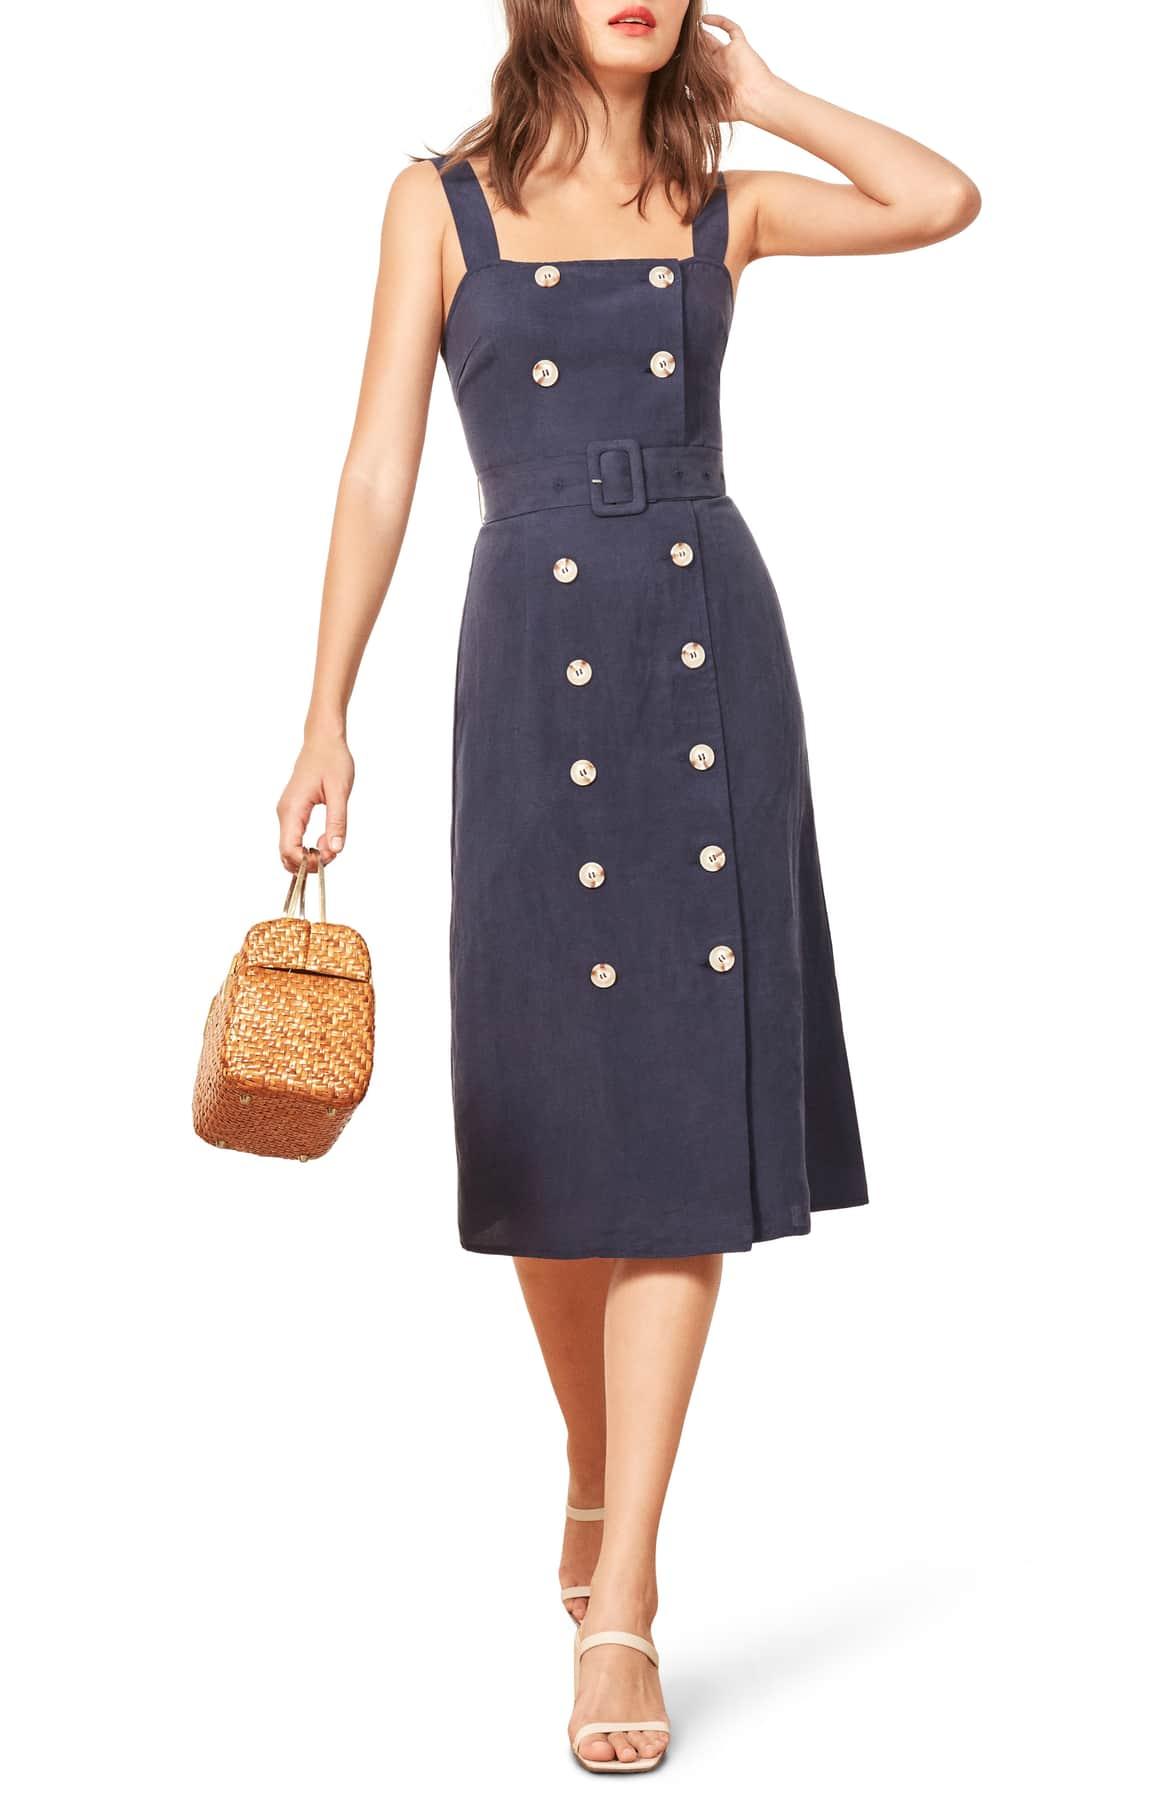 Reformation Palma Belted Dress